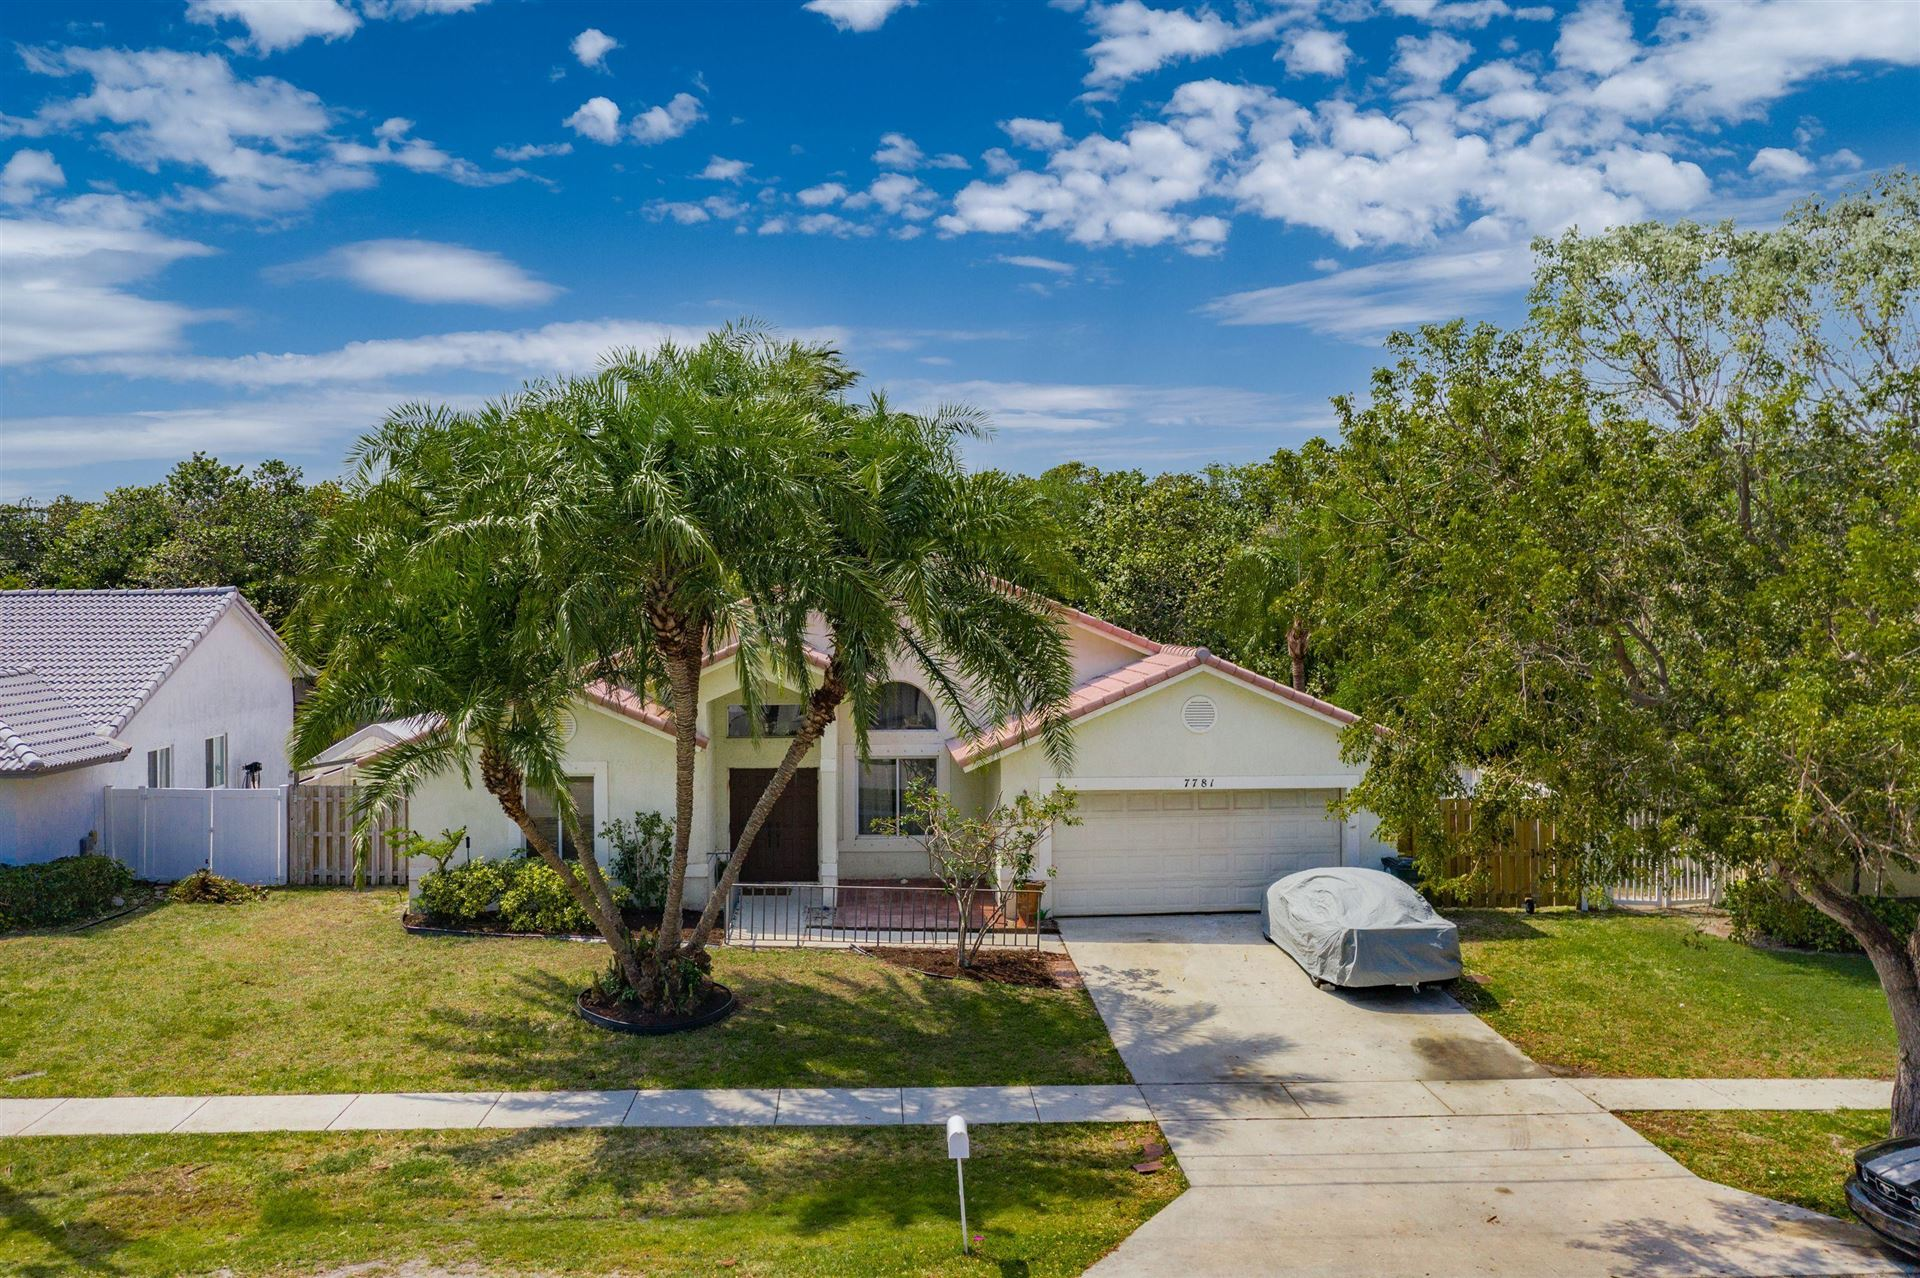 7781 Texas Trail, Boca Raton, FL 33487 - MLS#: RX-10703050